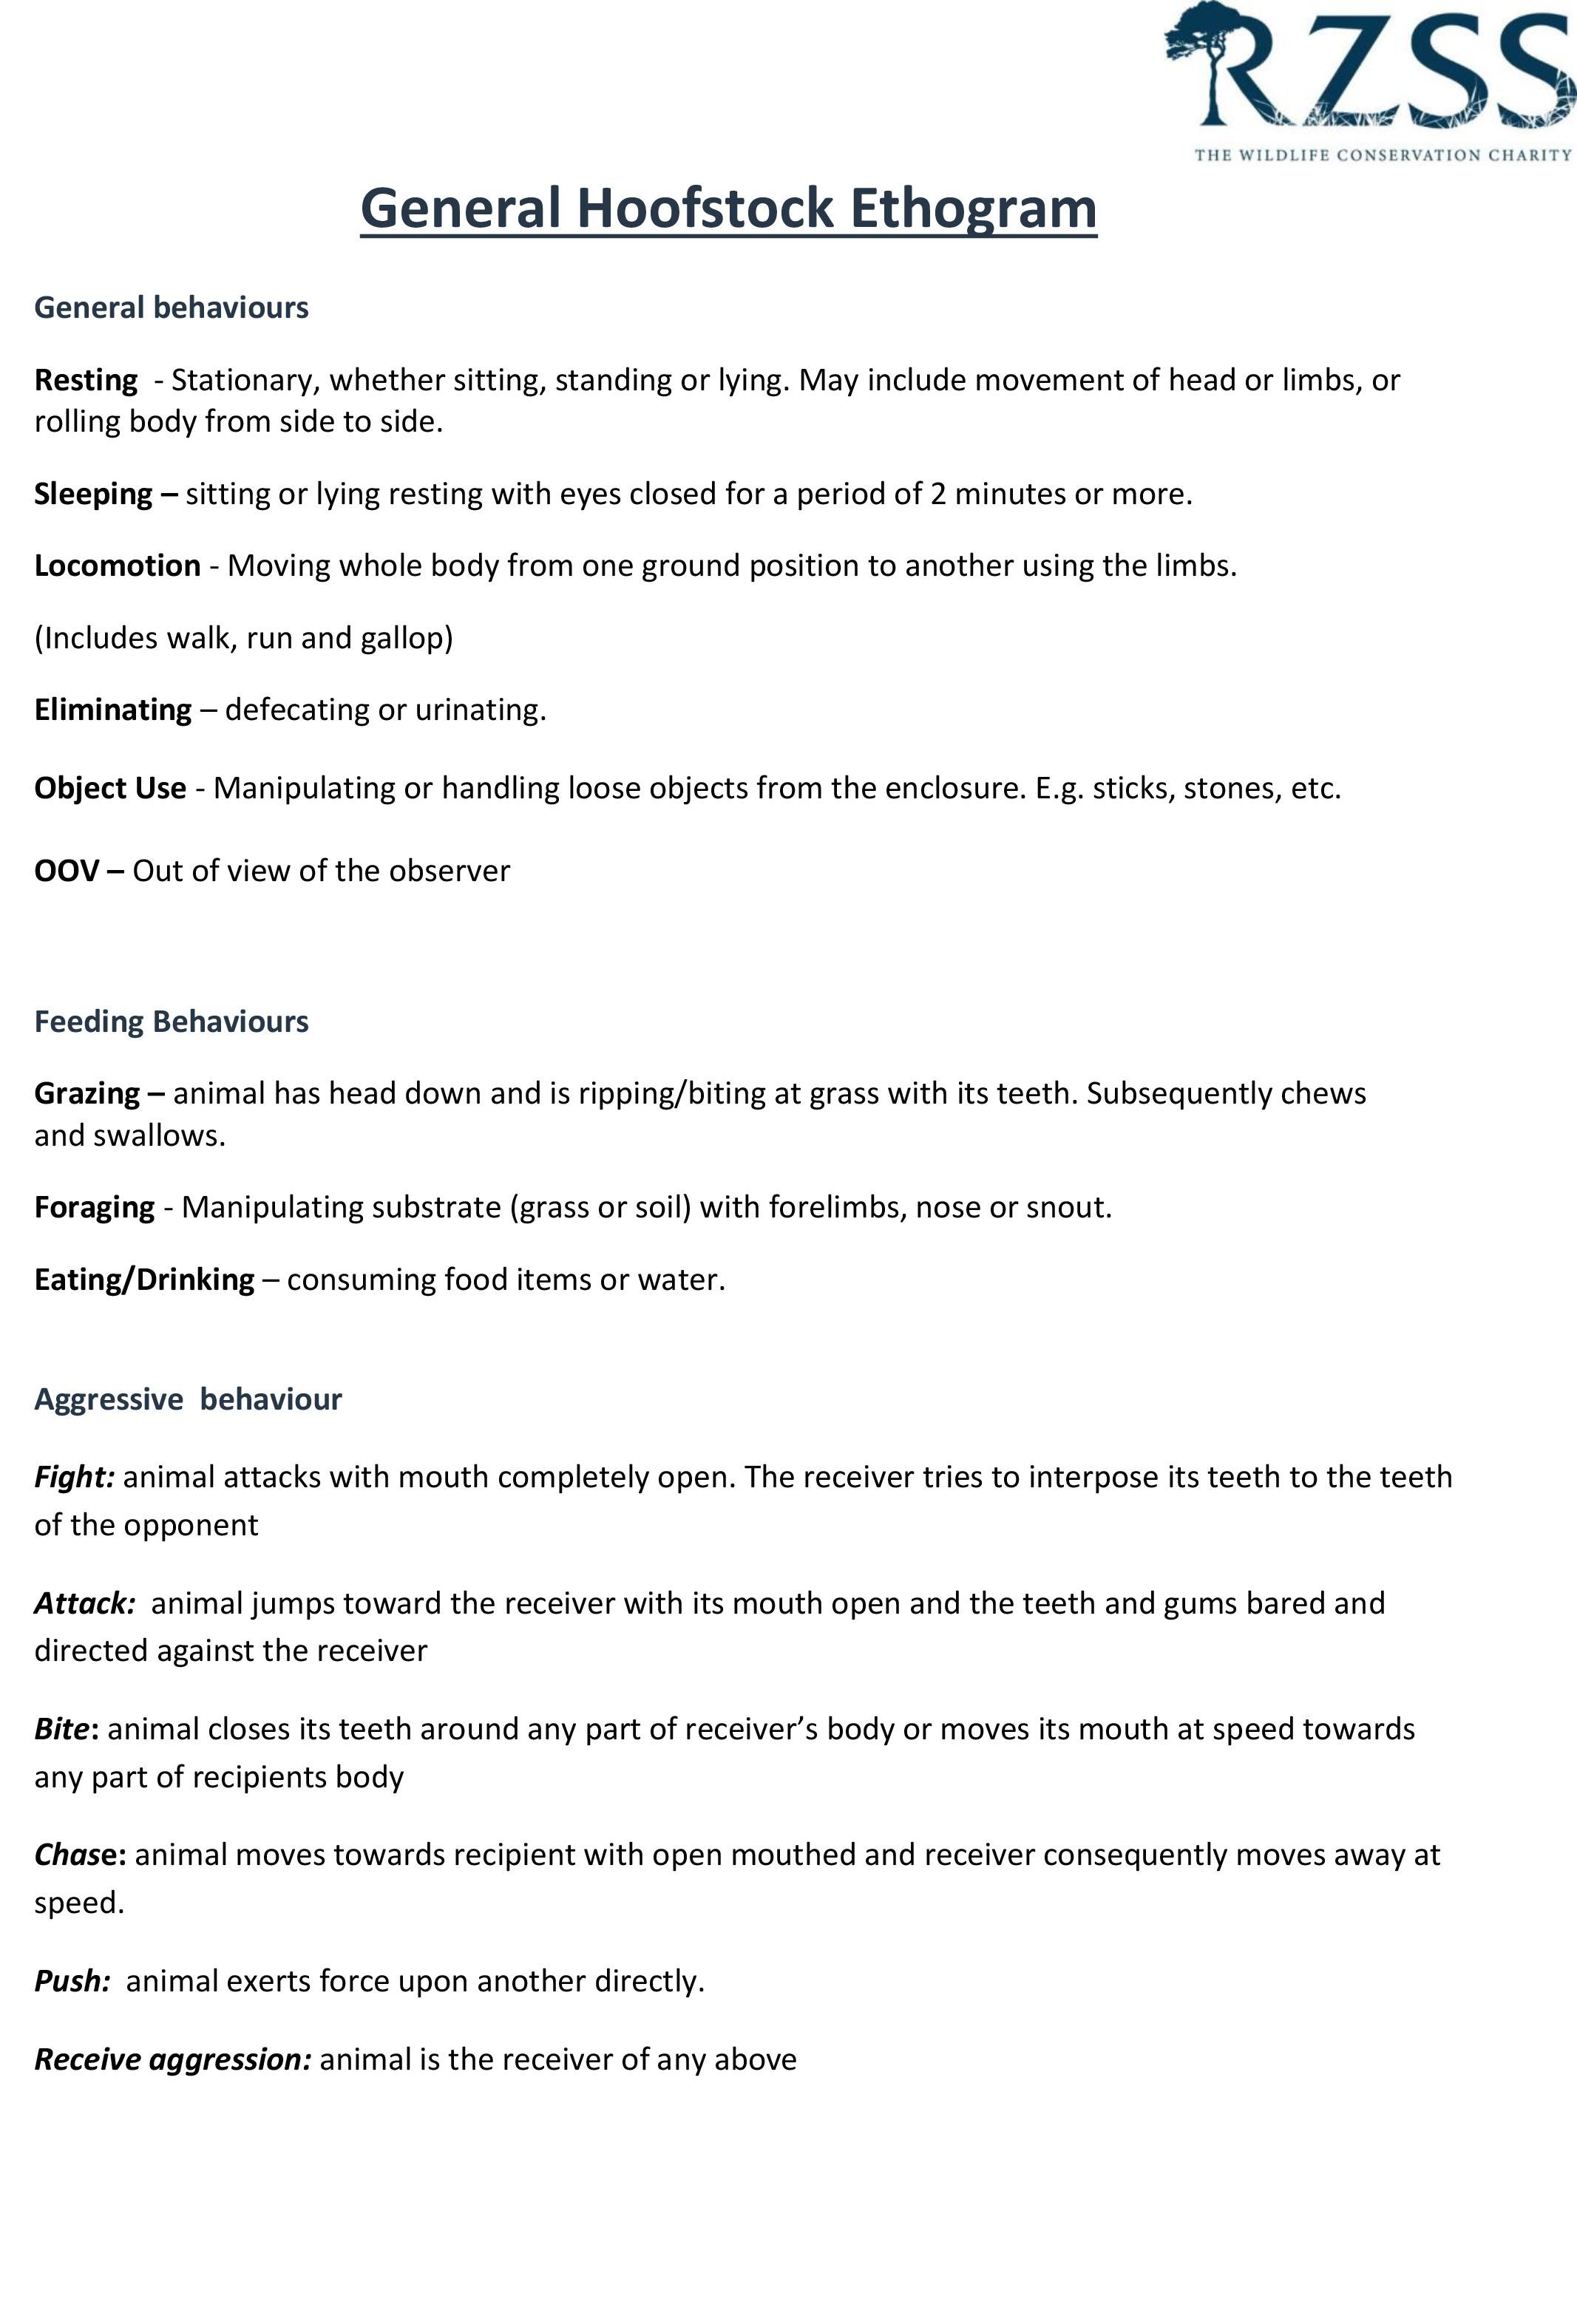 Hoofstock guidance 1